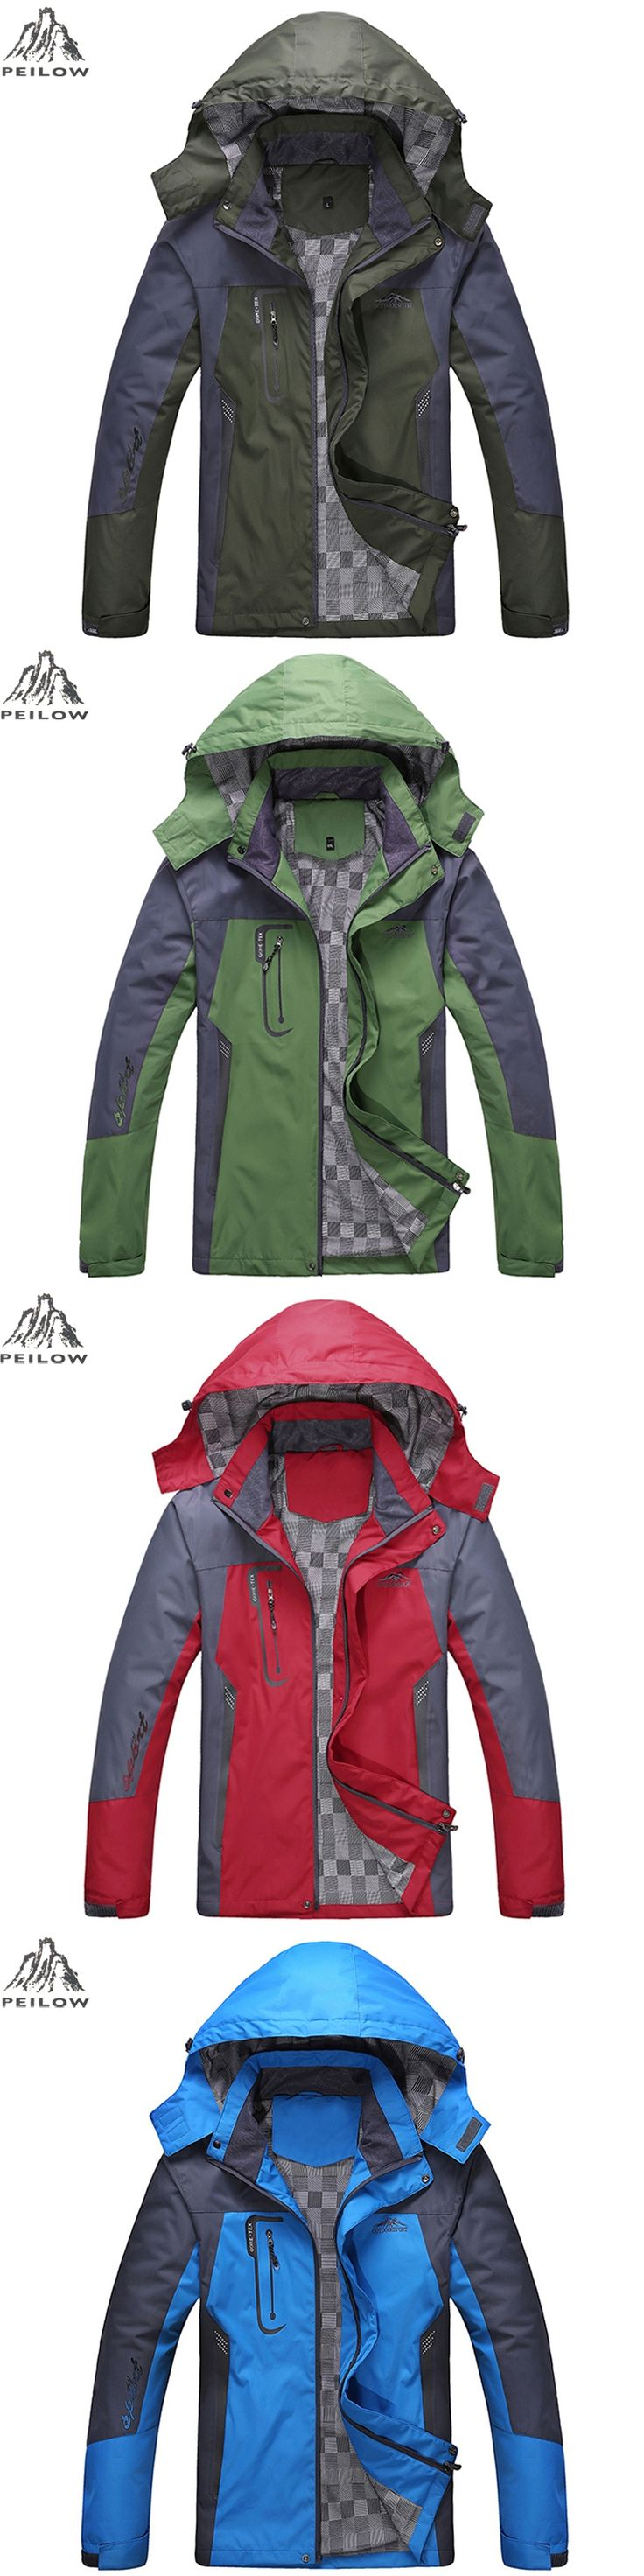 PEILOW women Men's Waterproof Windpoof Jackets Men Spring fall Jacket Coats Male Tourism Mountain Brand Clothing Plus Size L-5XL